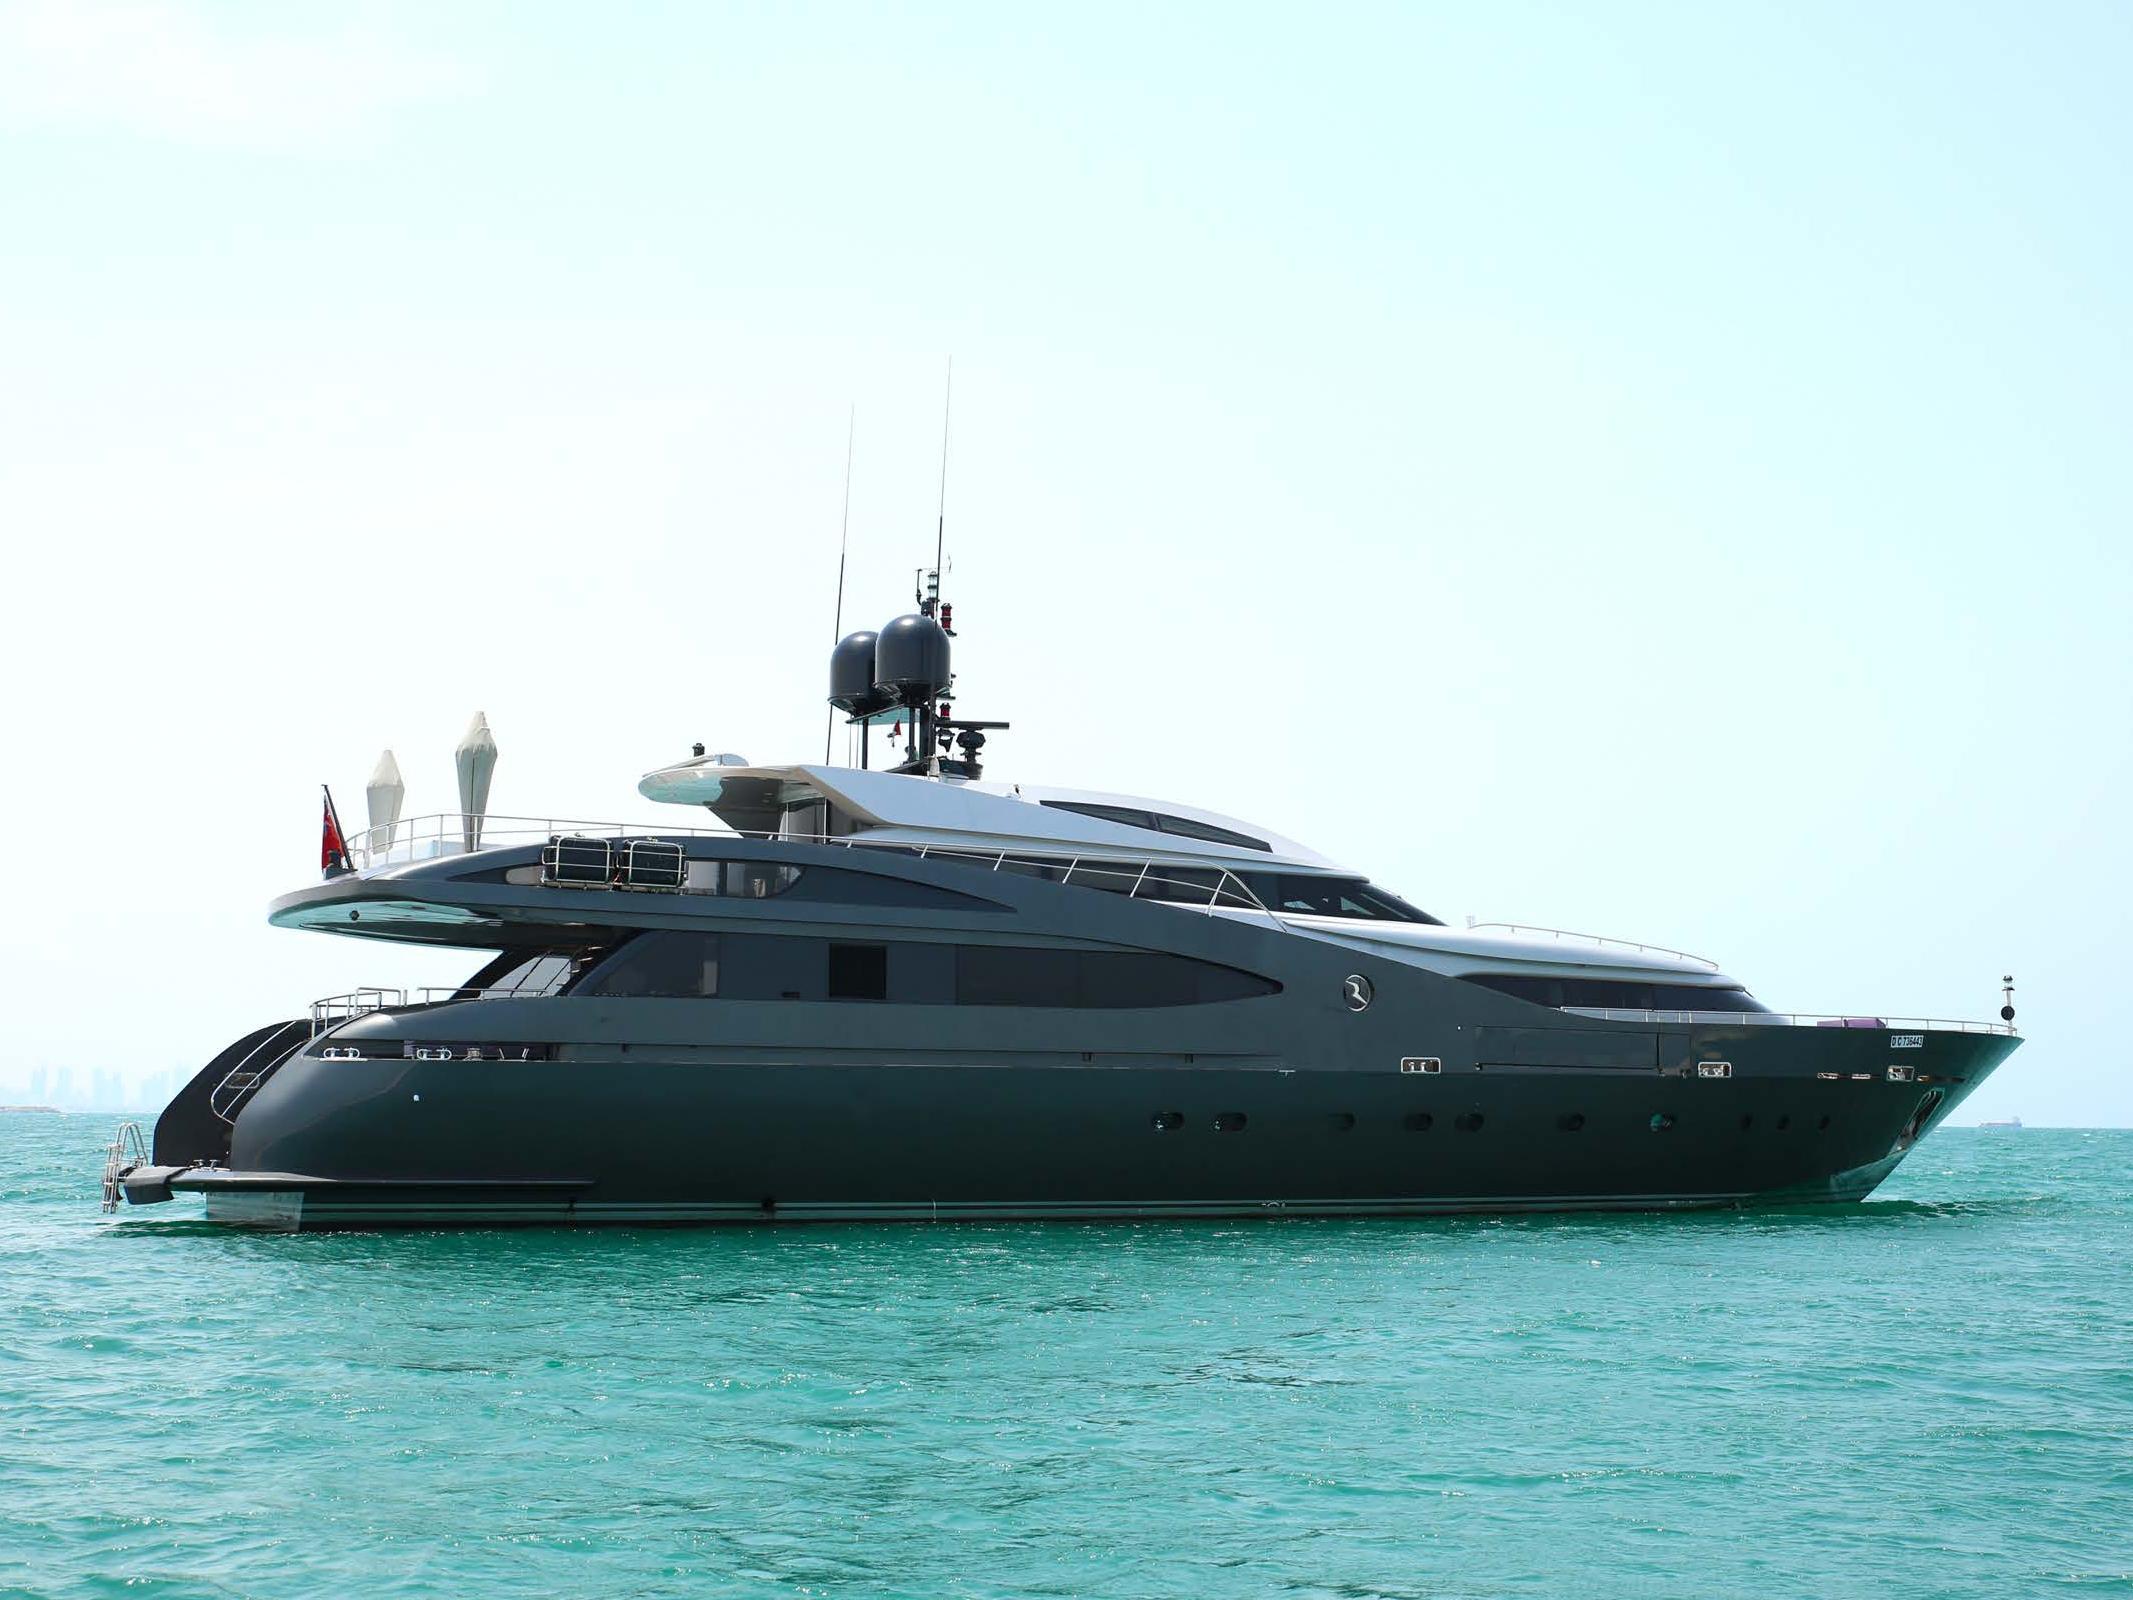 Luxury Yacht Rental Dubai   Best Yacht Charter Rentals in Dubai UAE